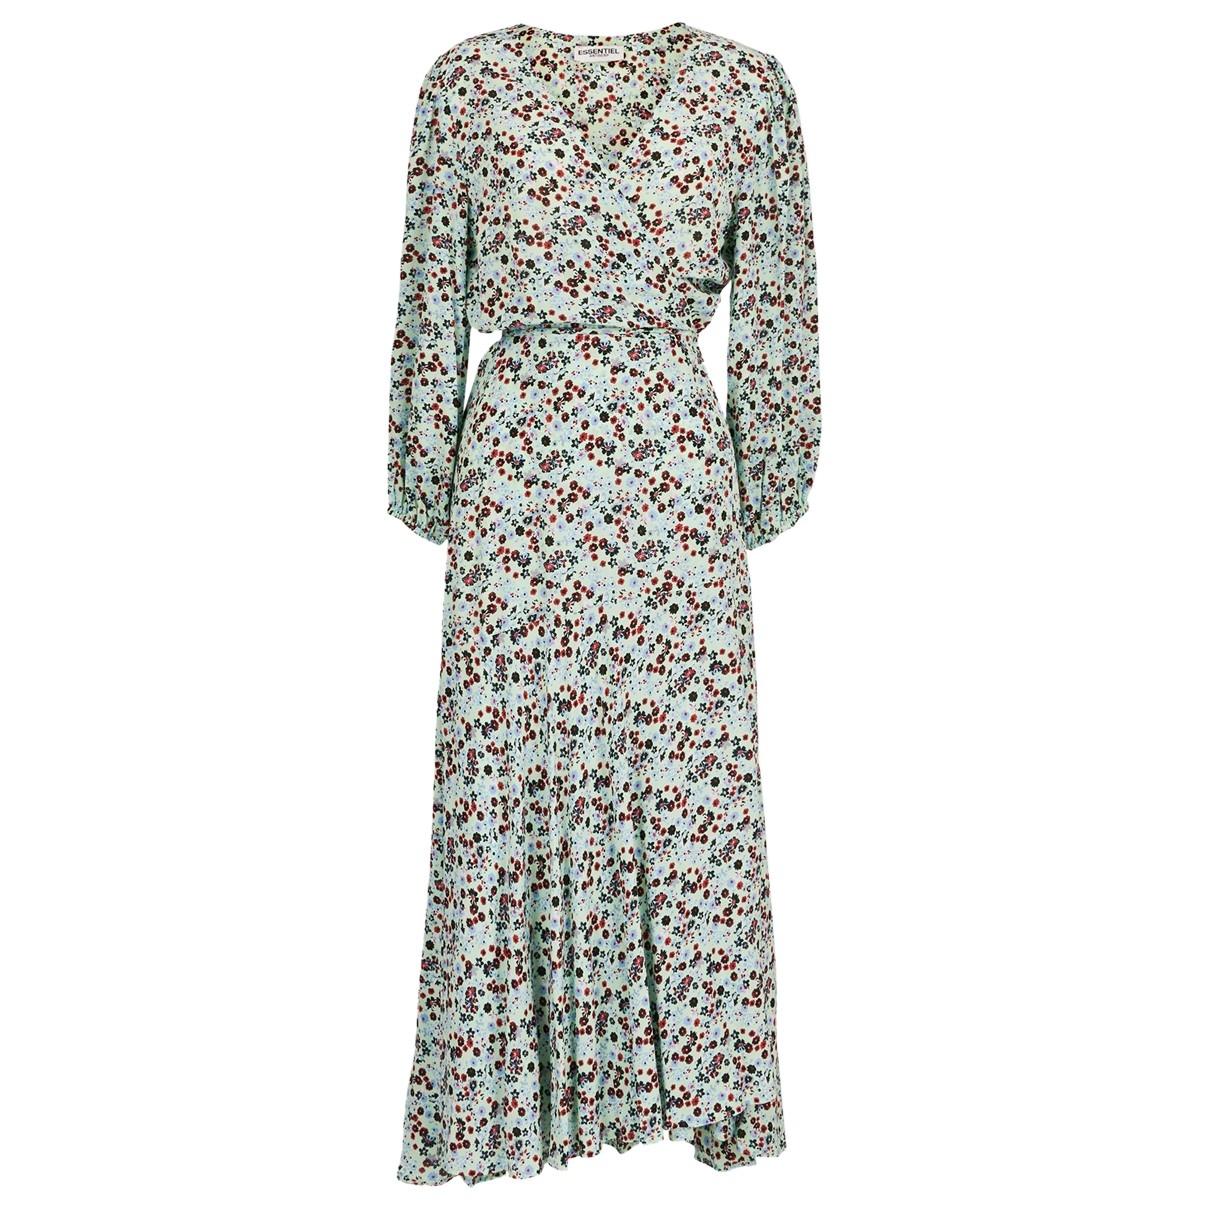 Essentiel Antwerp \N dress for Women 8 UK